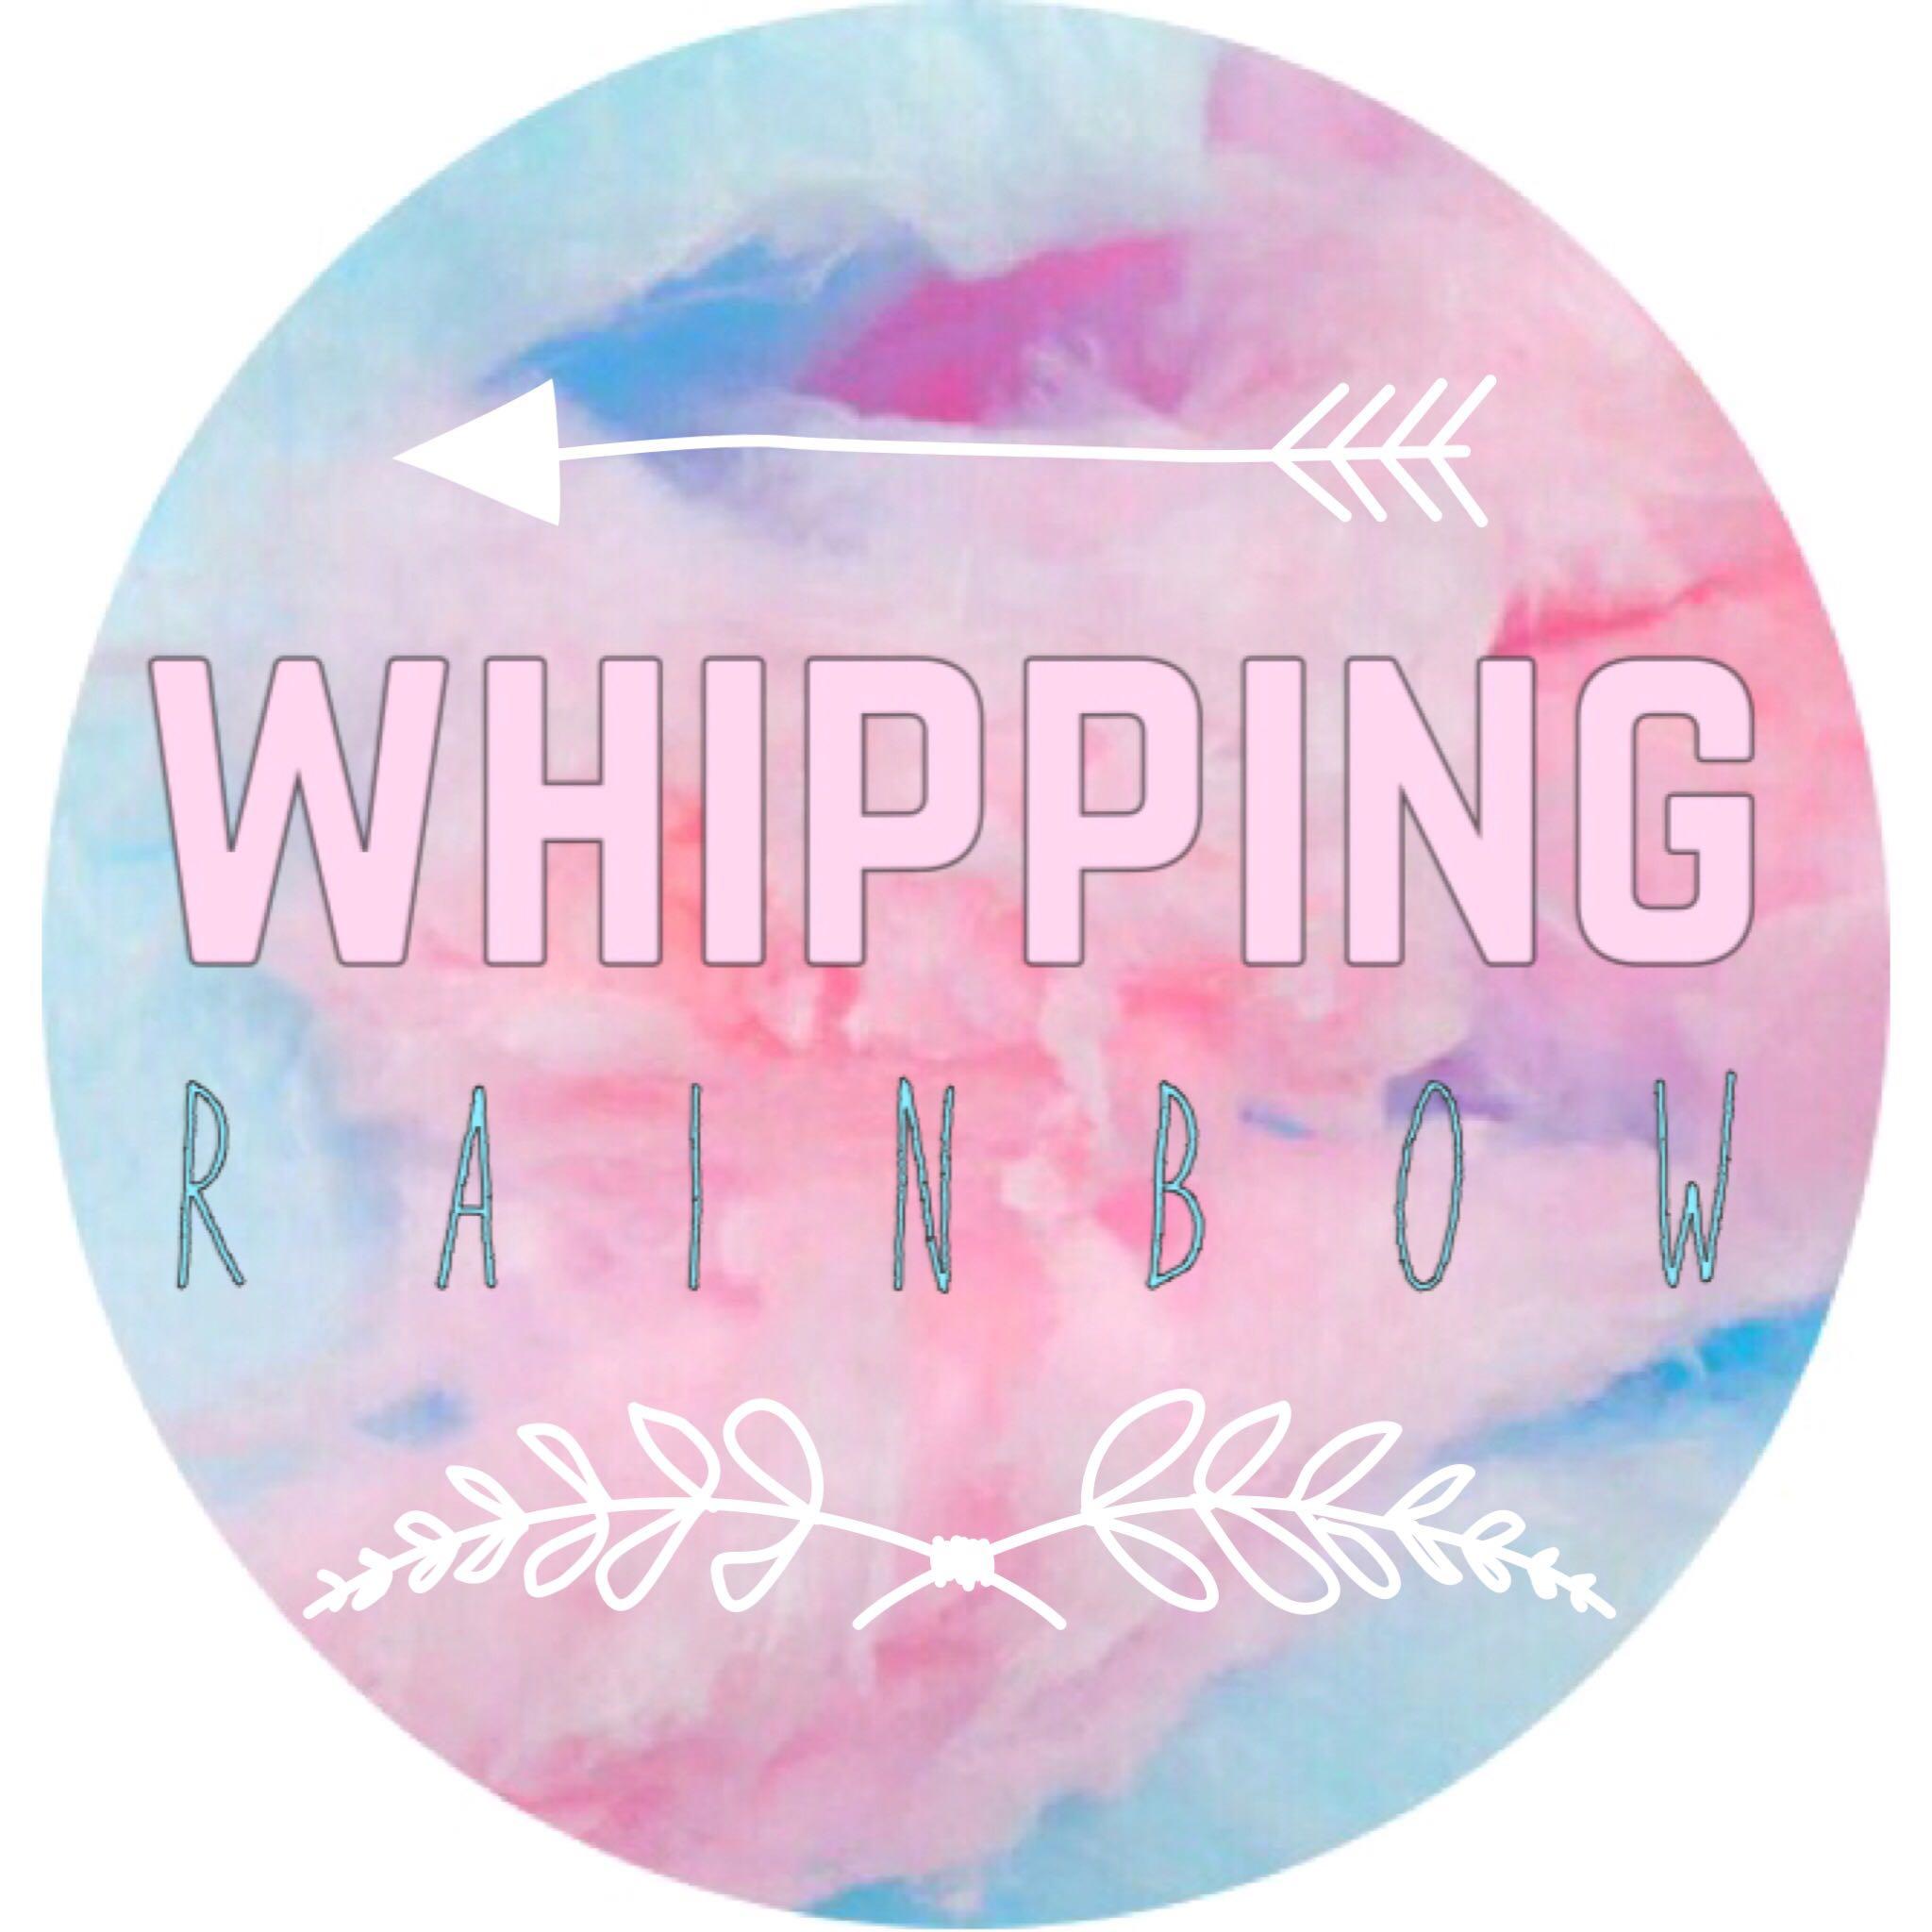 whippingrainbow